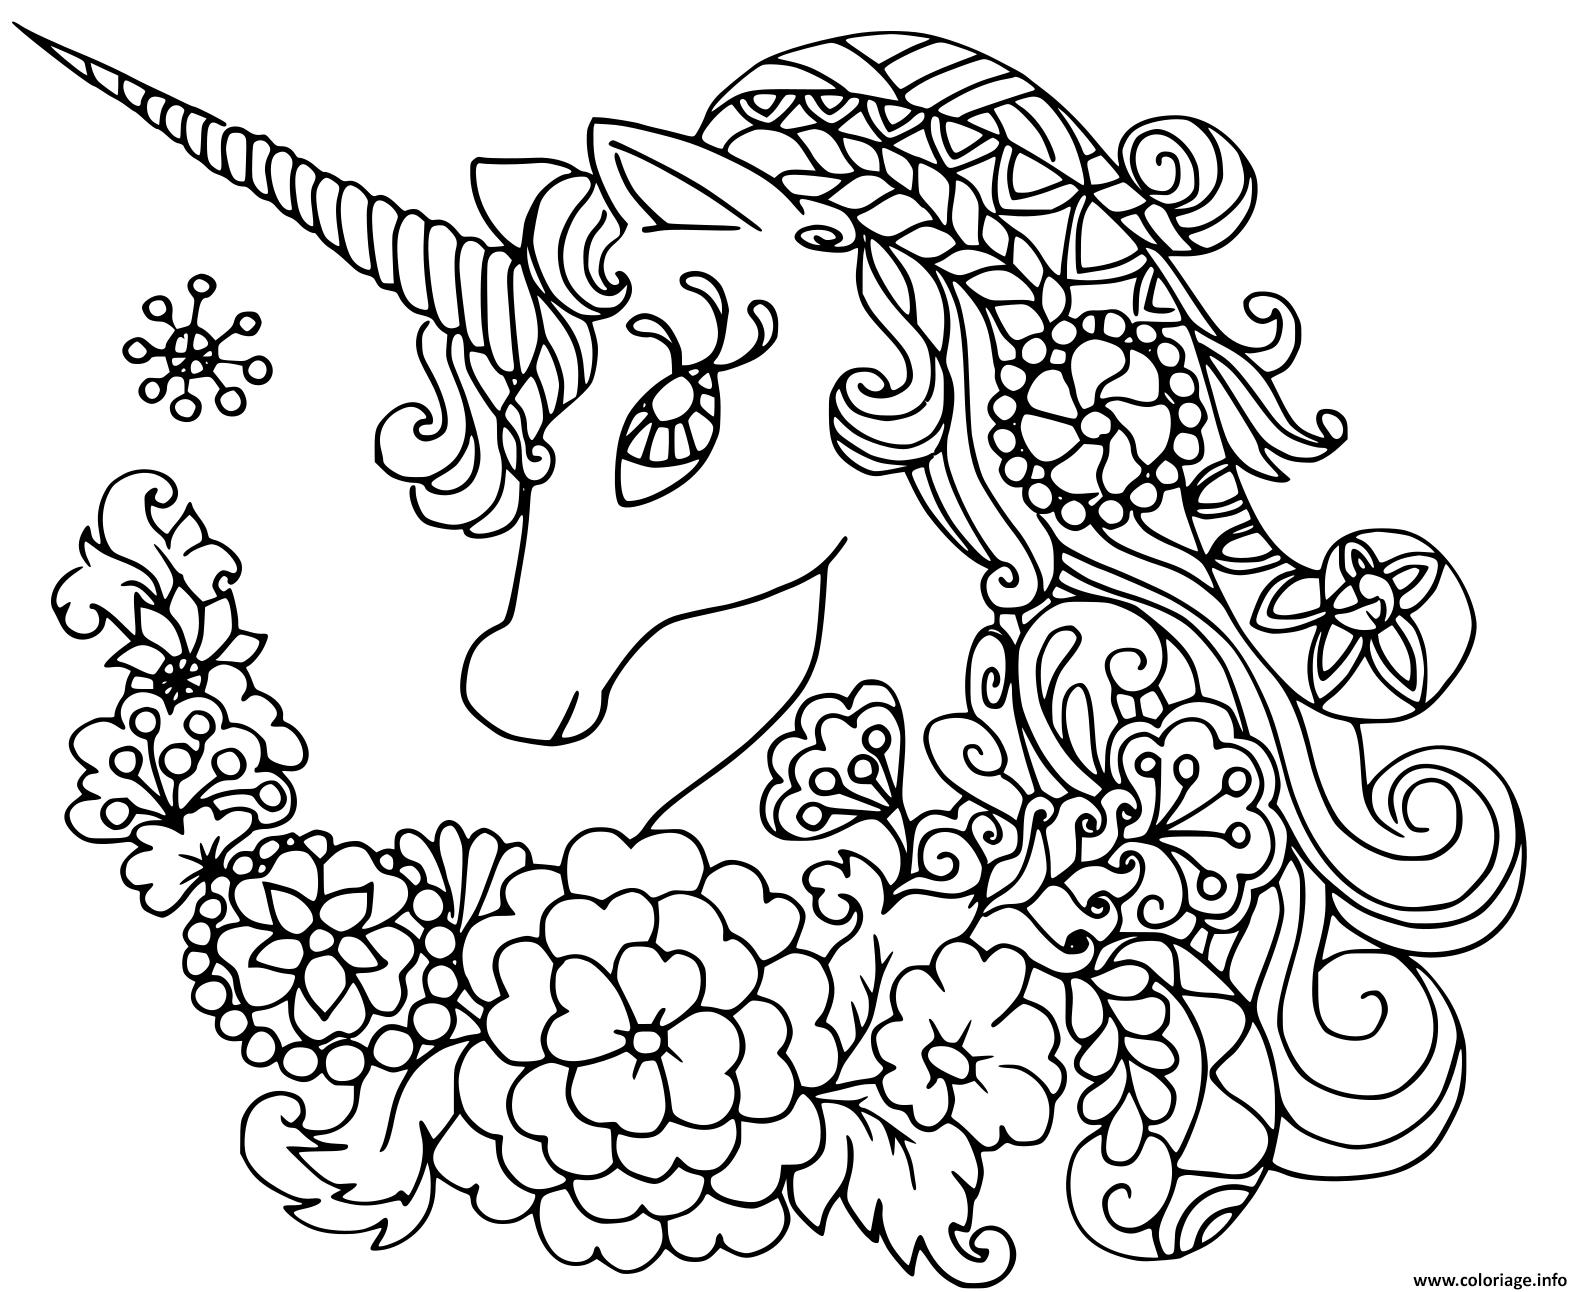 Coloriage Licorne Mandala Avec De Jolies Fleurs Dessin ...